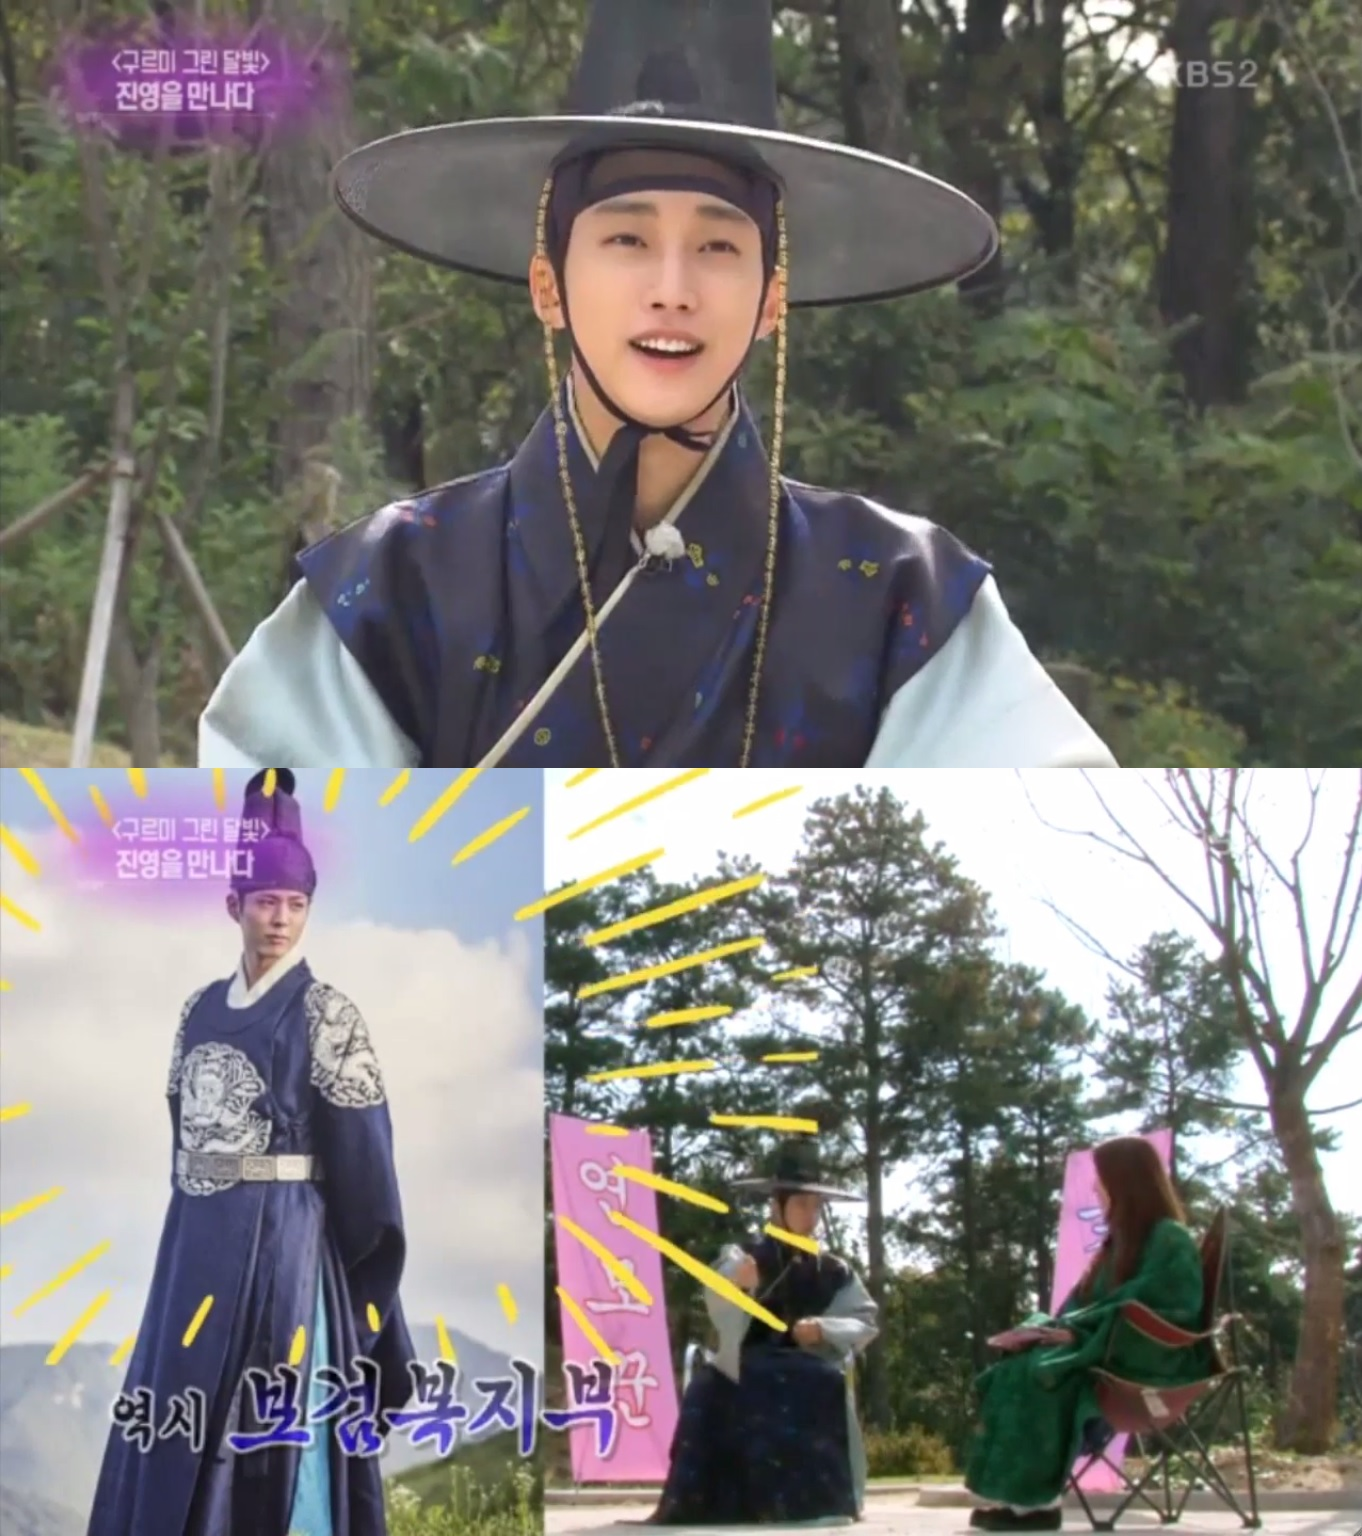 b1a4 jinyoung park bo gum